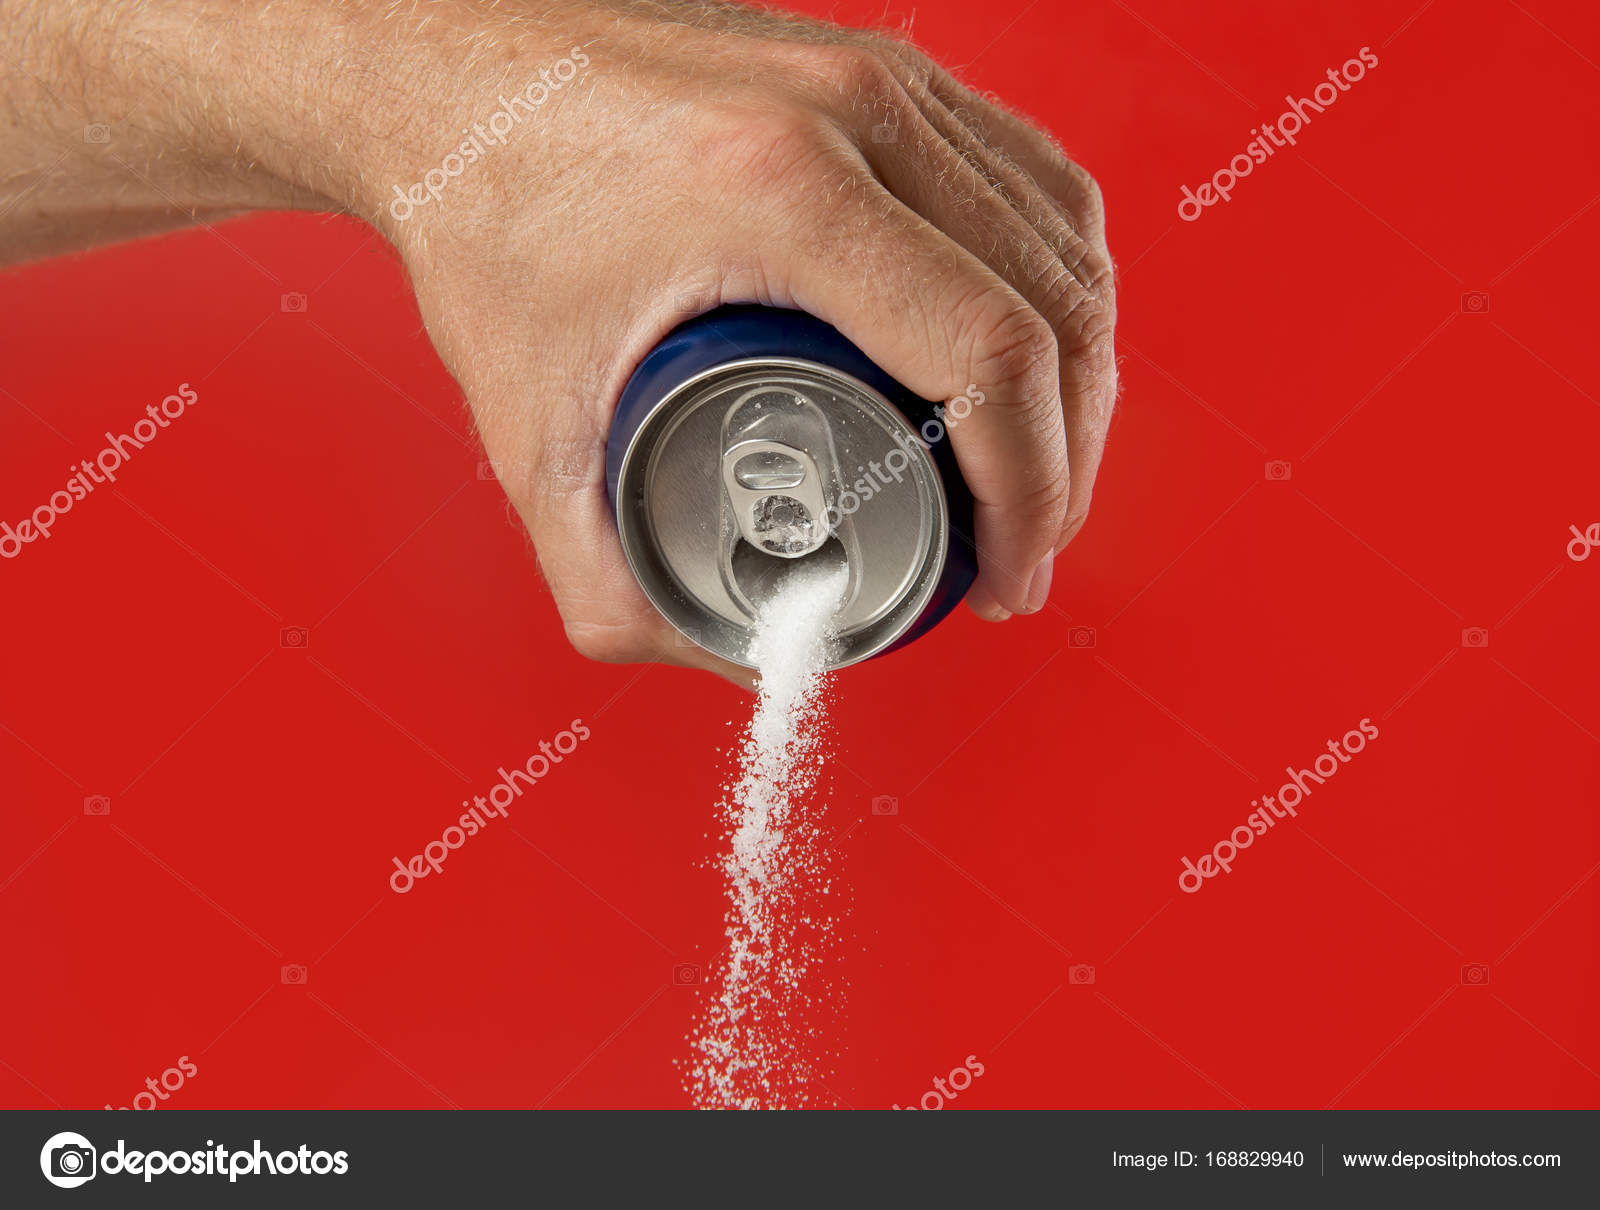 Потребляют ли наркоманы много сахара